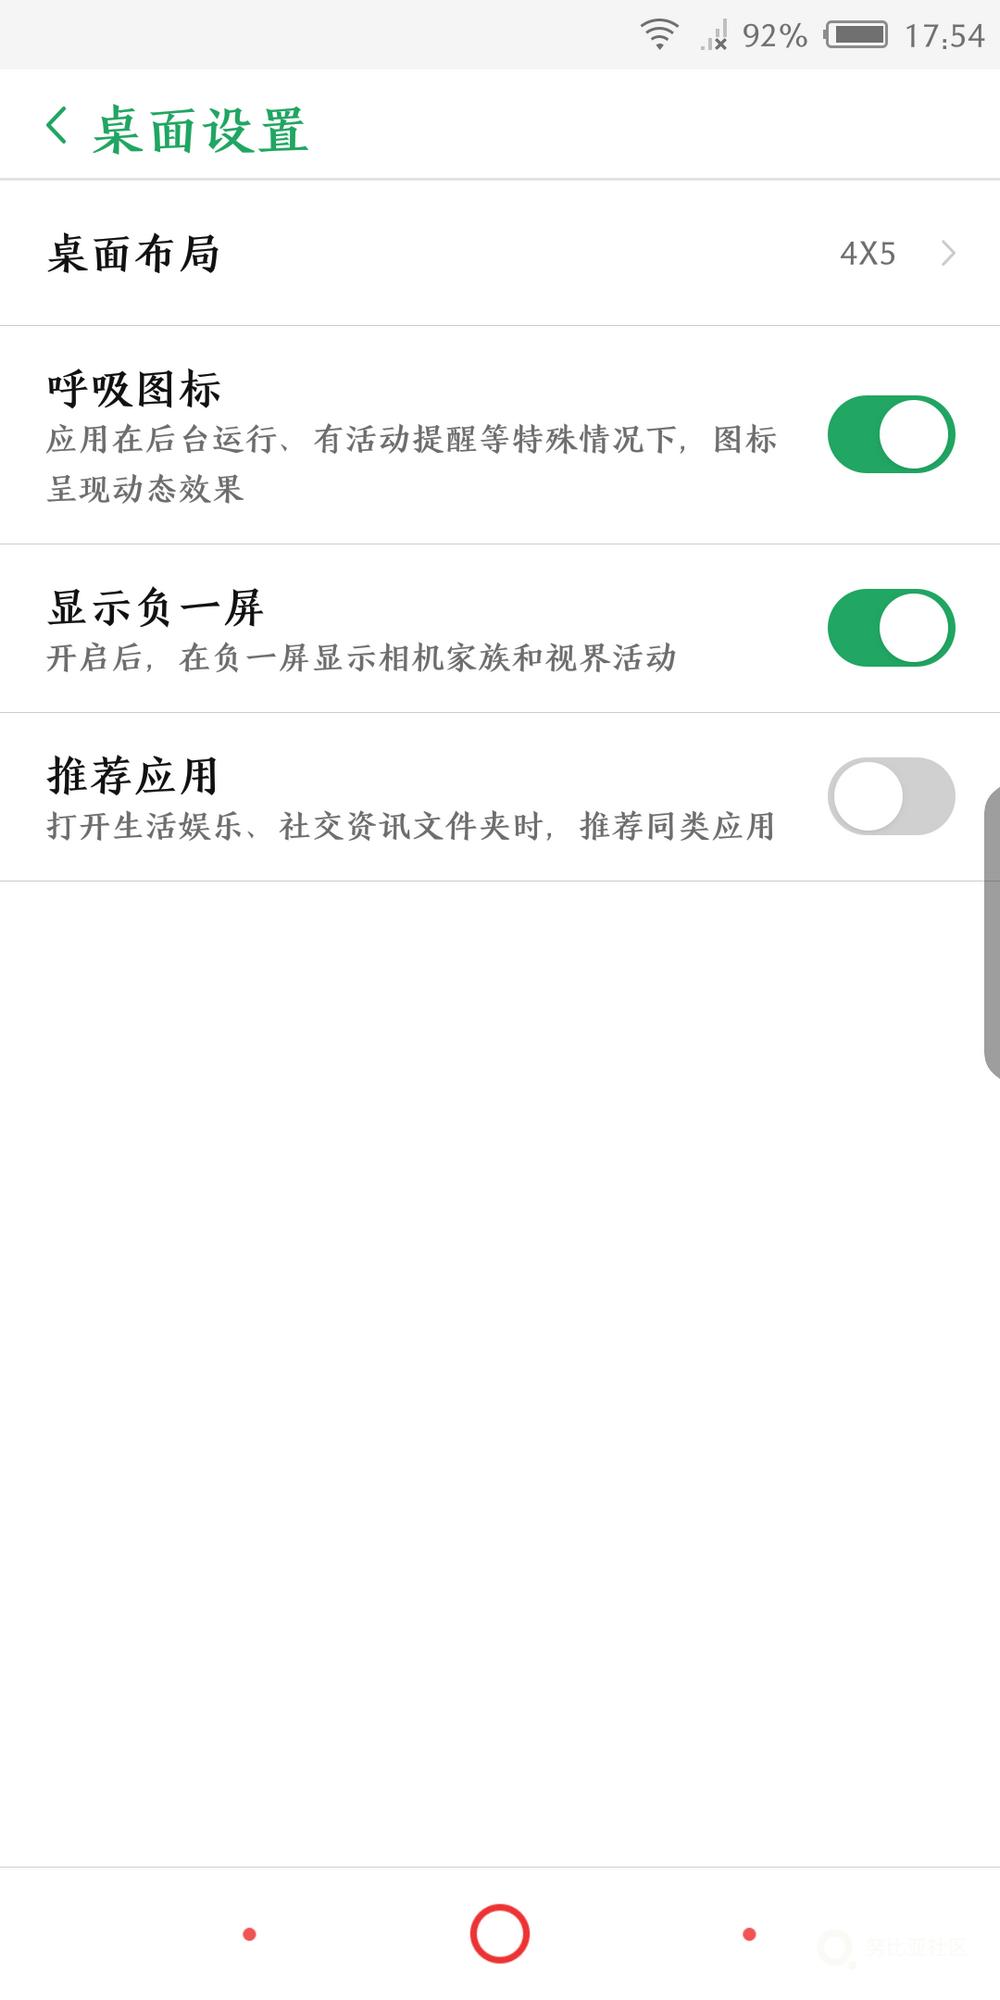 Screenshot_2018-05-01-17-54-04.png